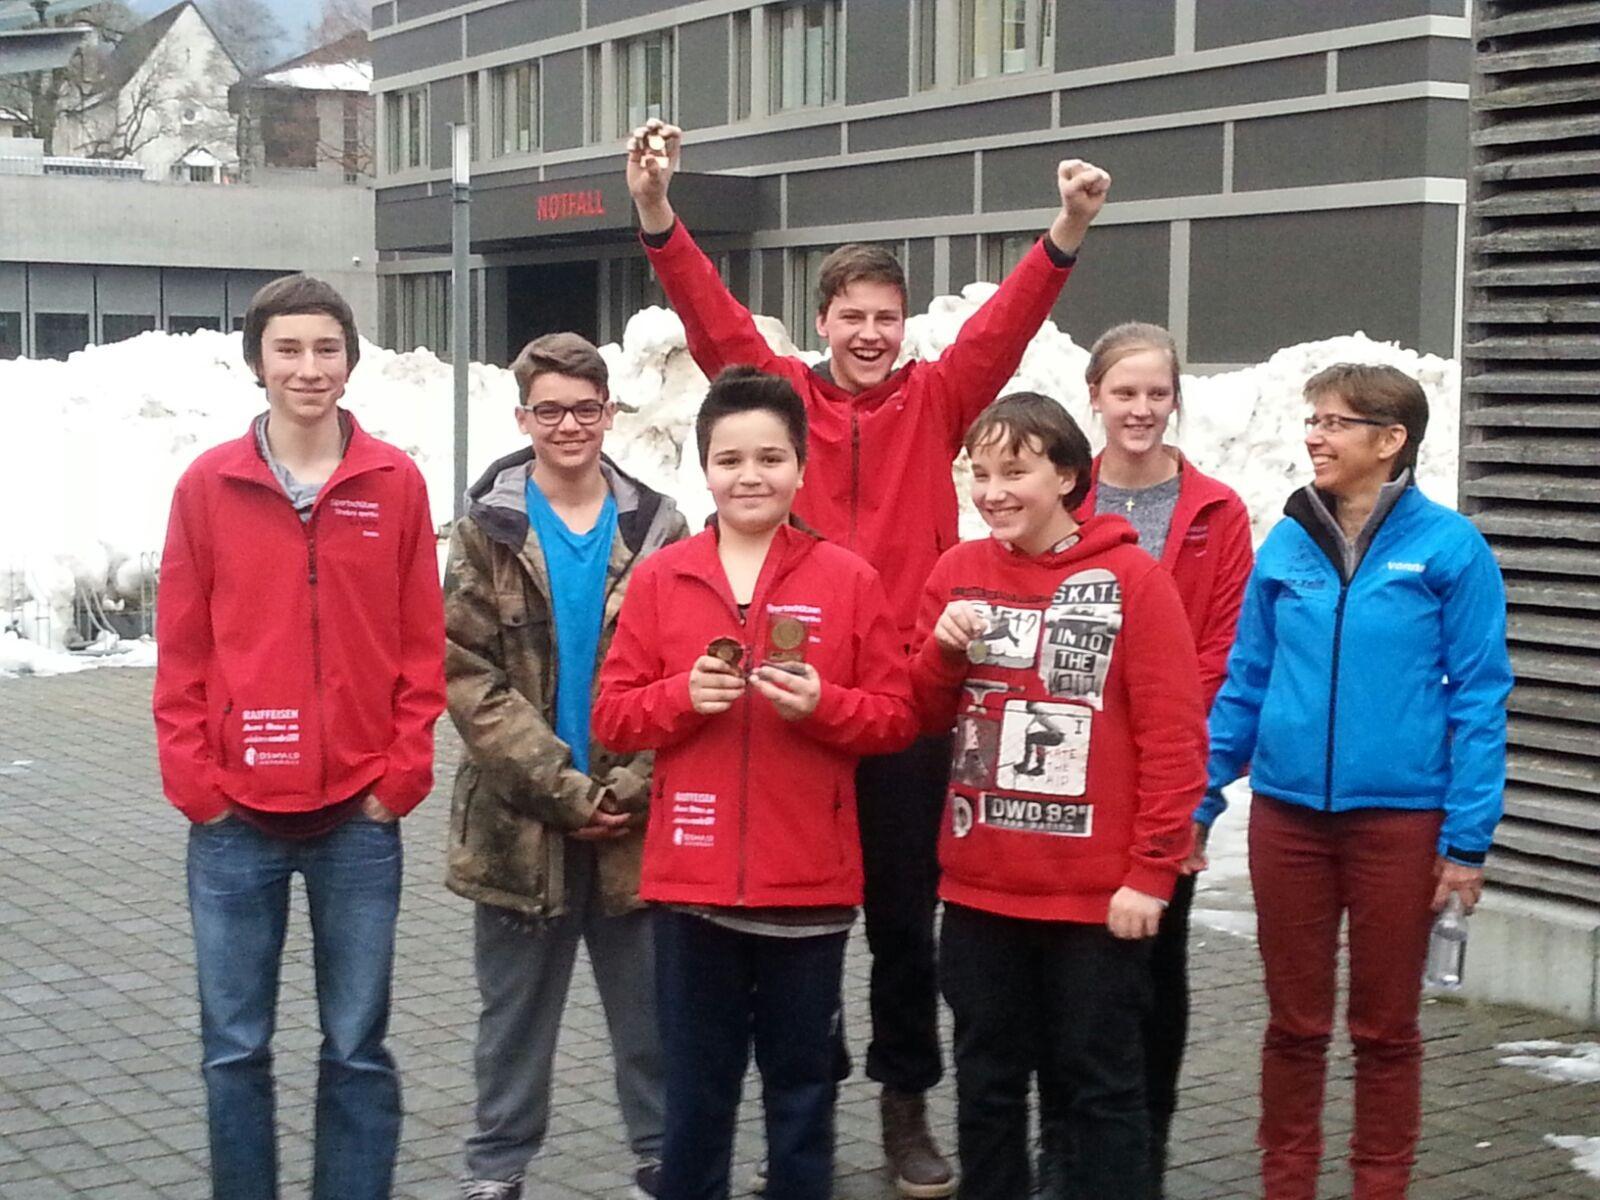 Jugendtag 7.2.16 Schiers mit Sandro, Paul, Tino, Nico, Angelo, Lorena, Yvonne v.l.